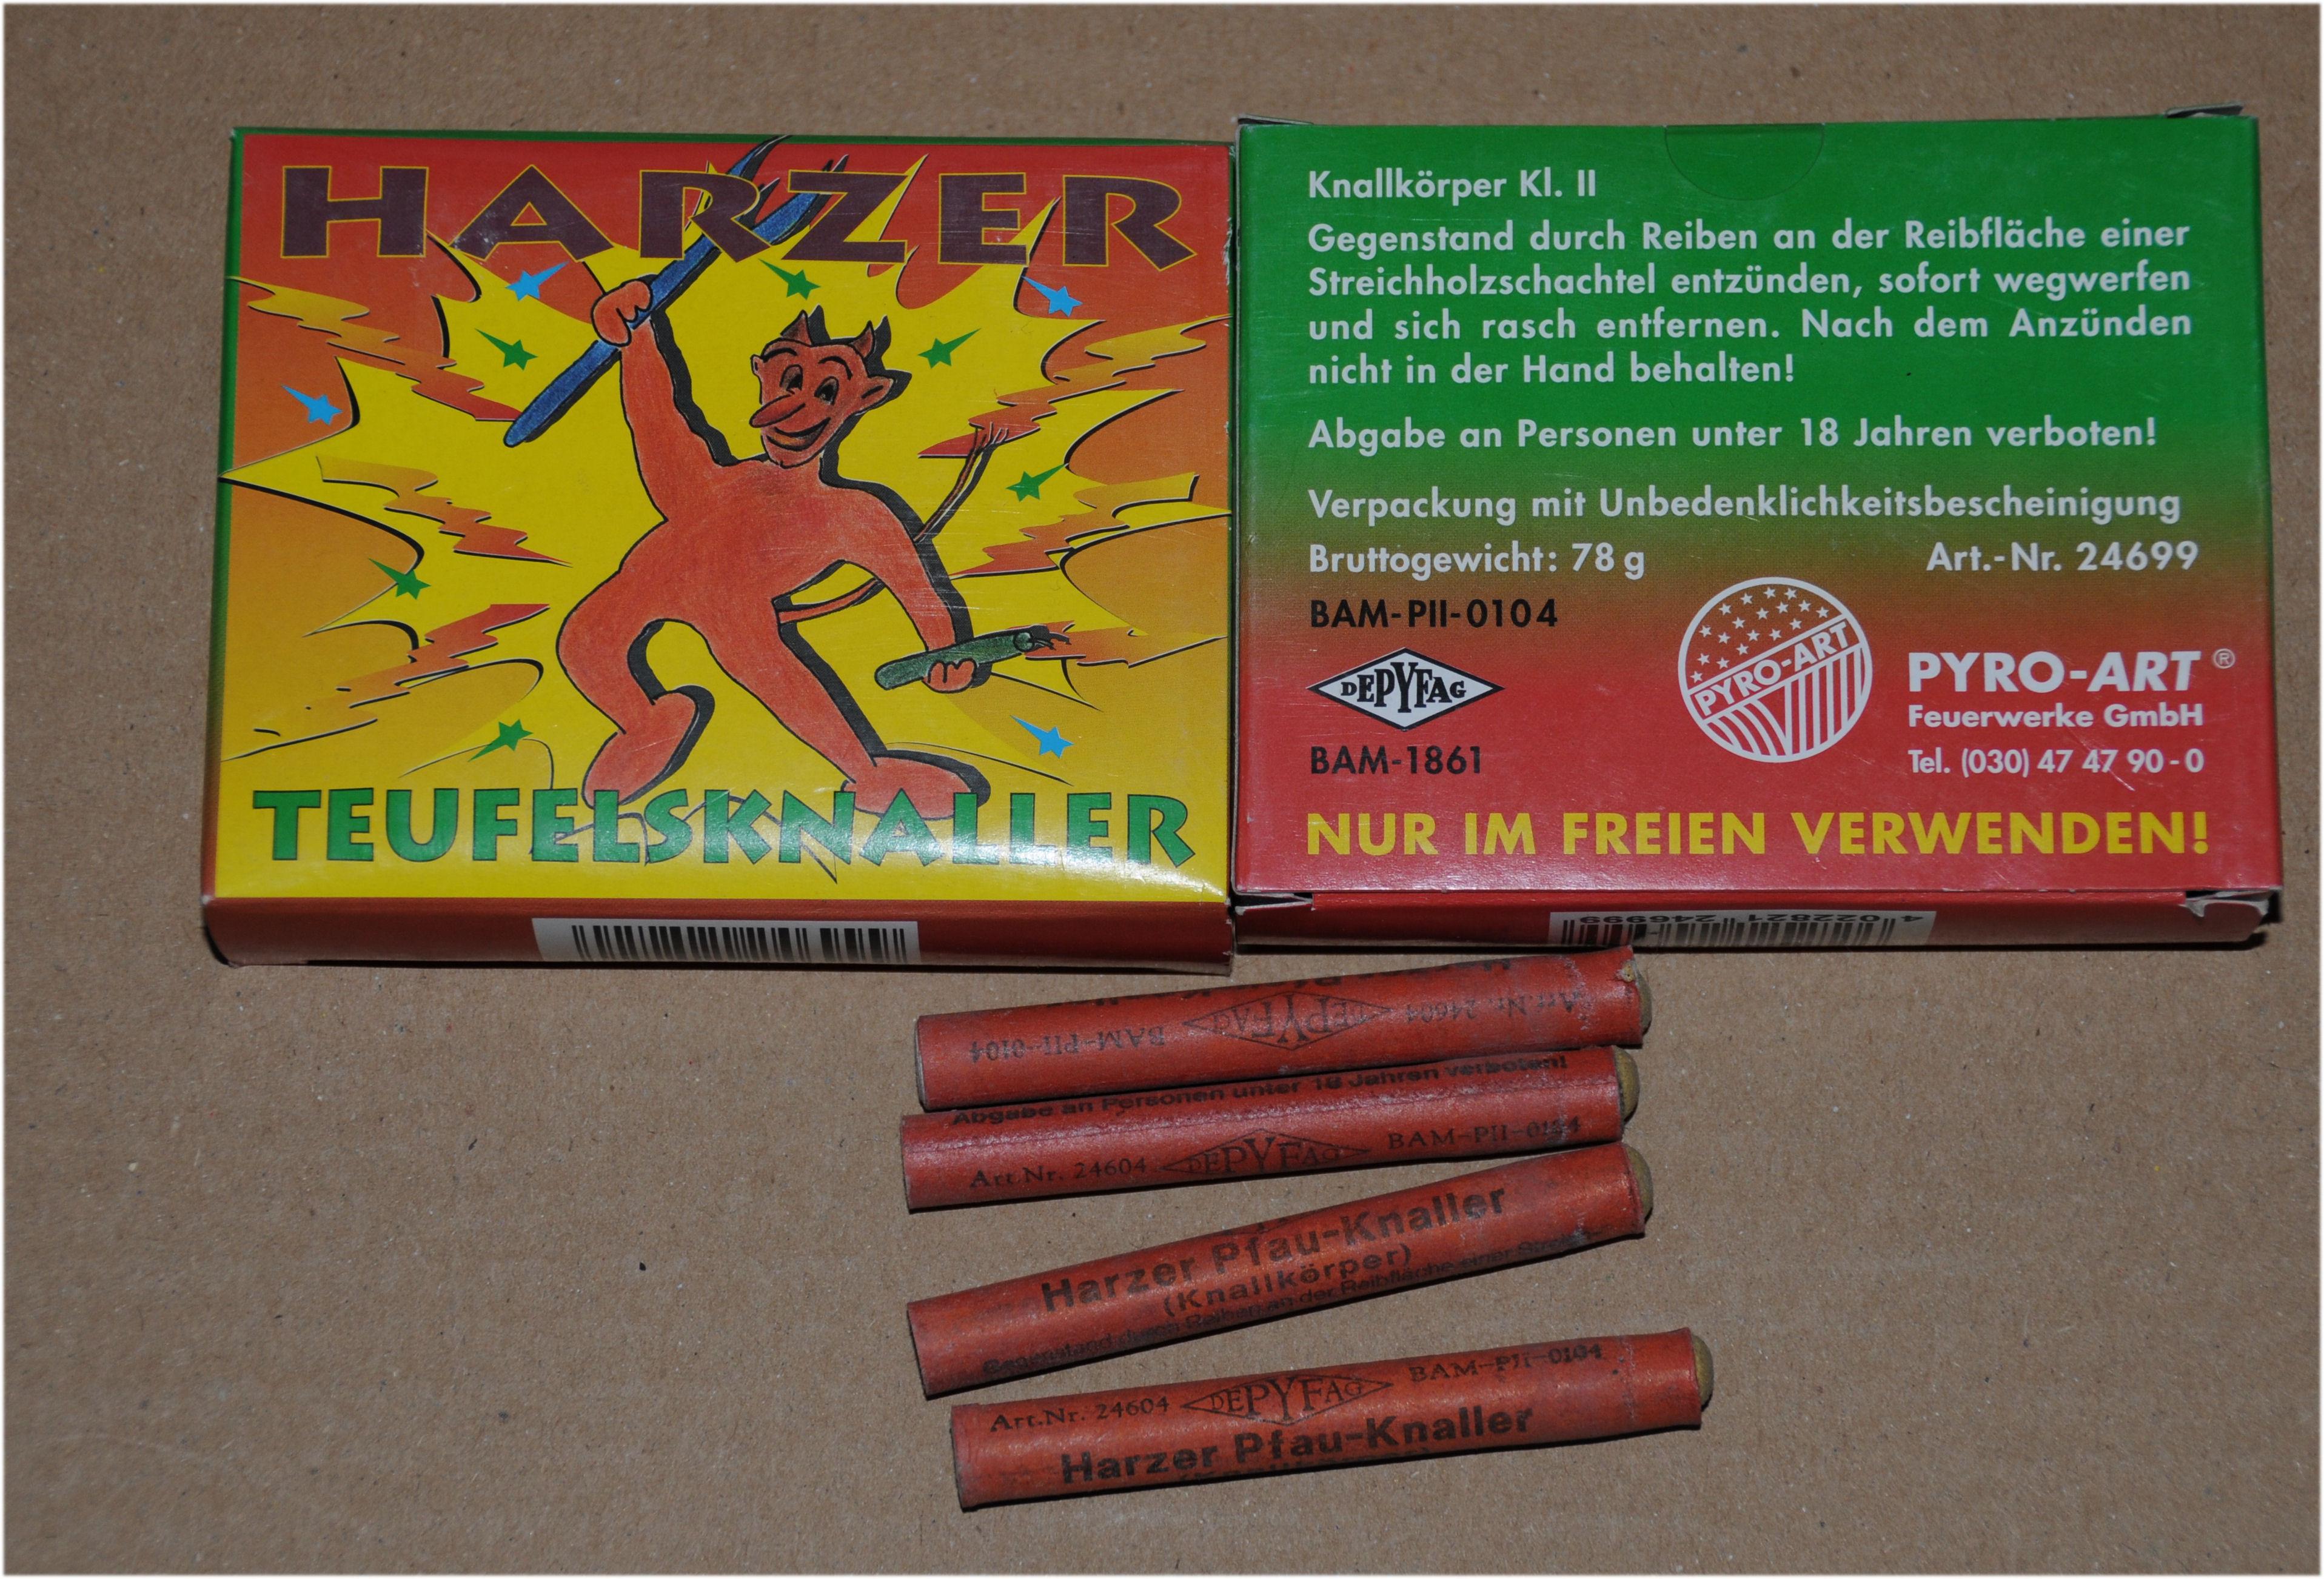 Harzer single power